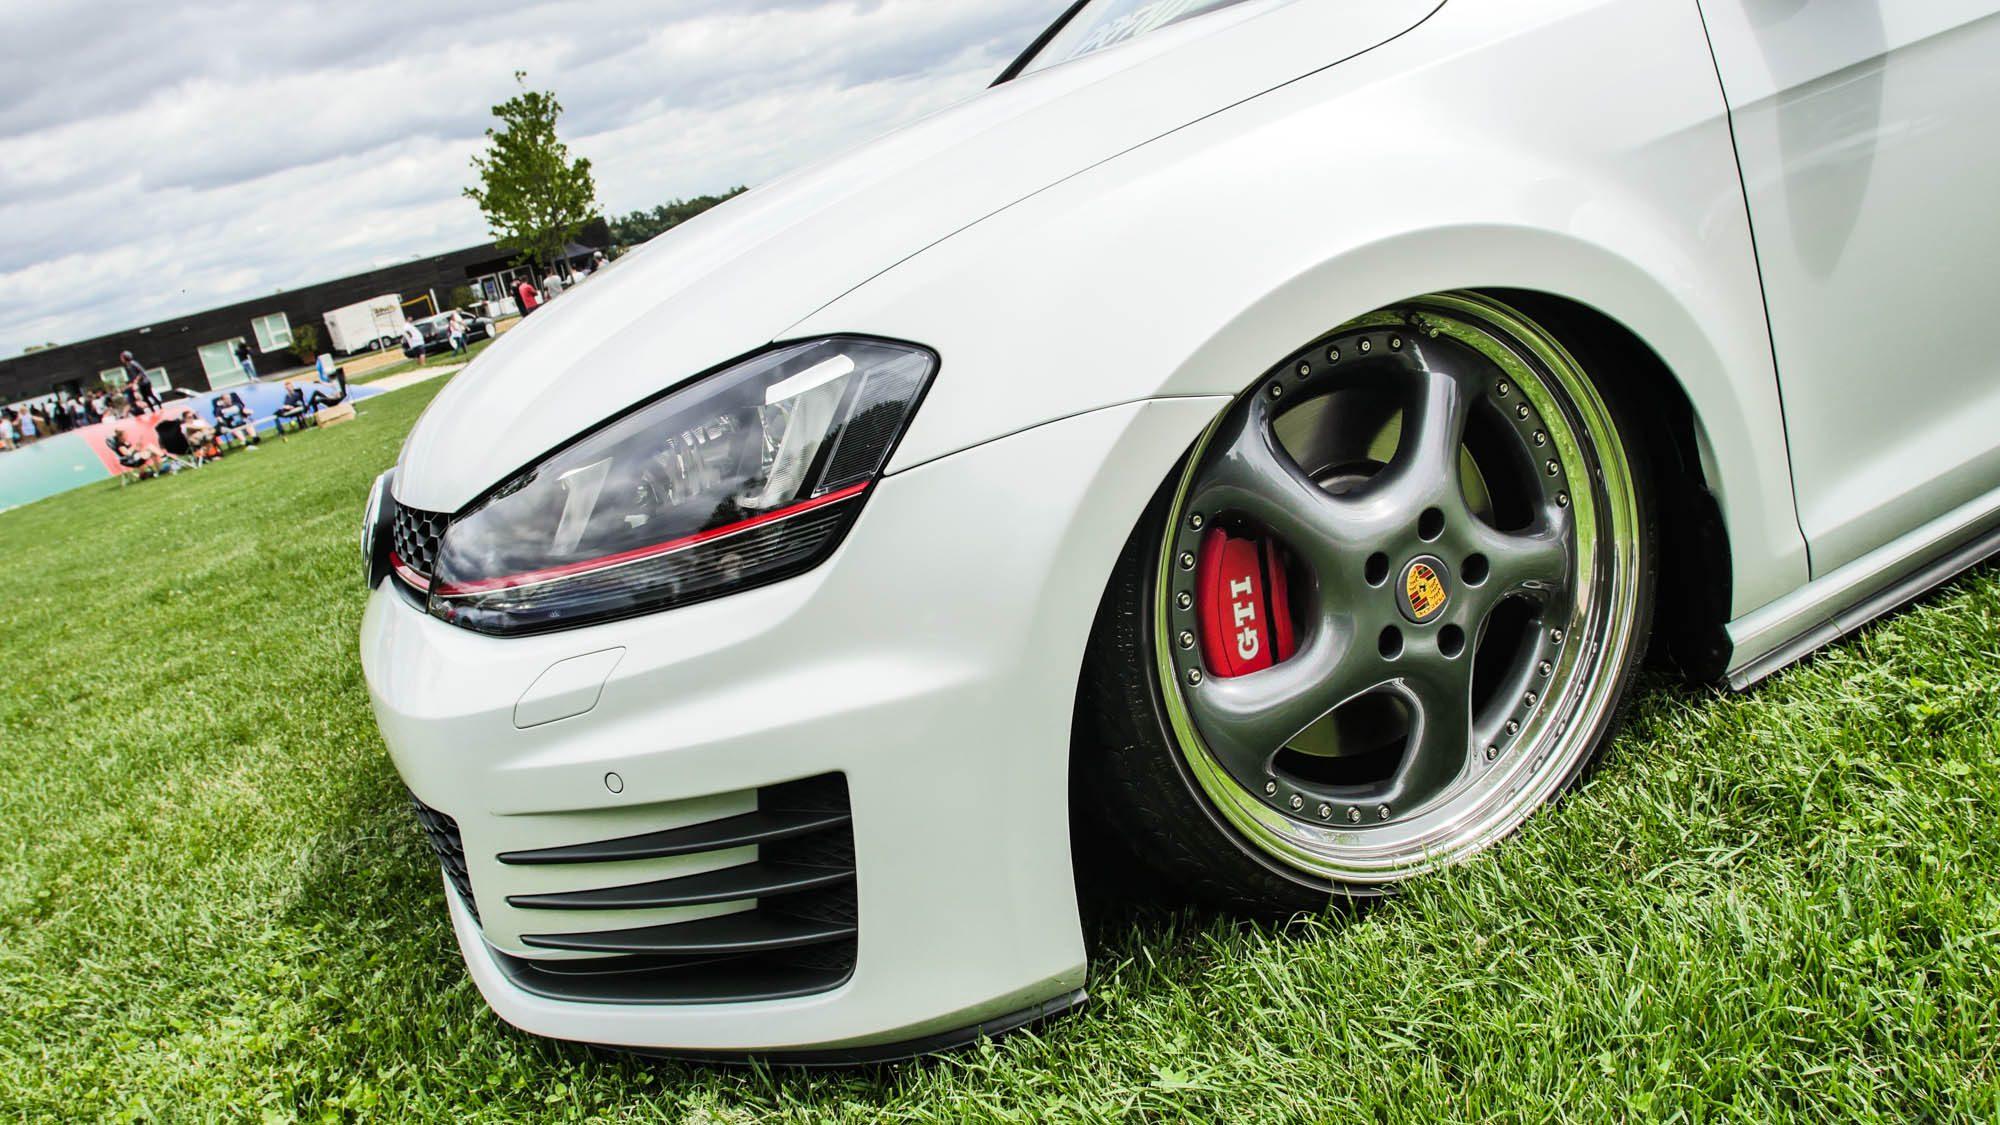 Frontpartie des VW Golf VII GTI